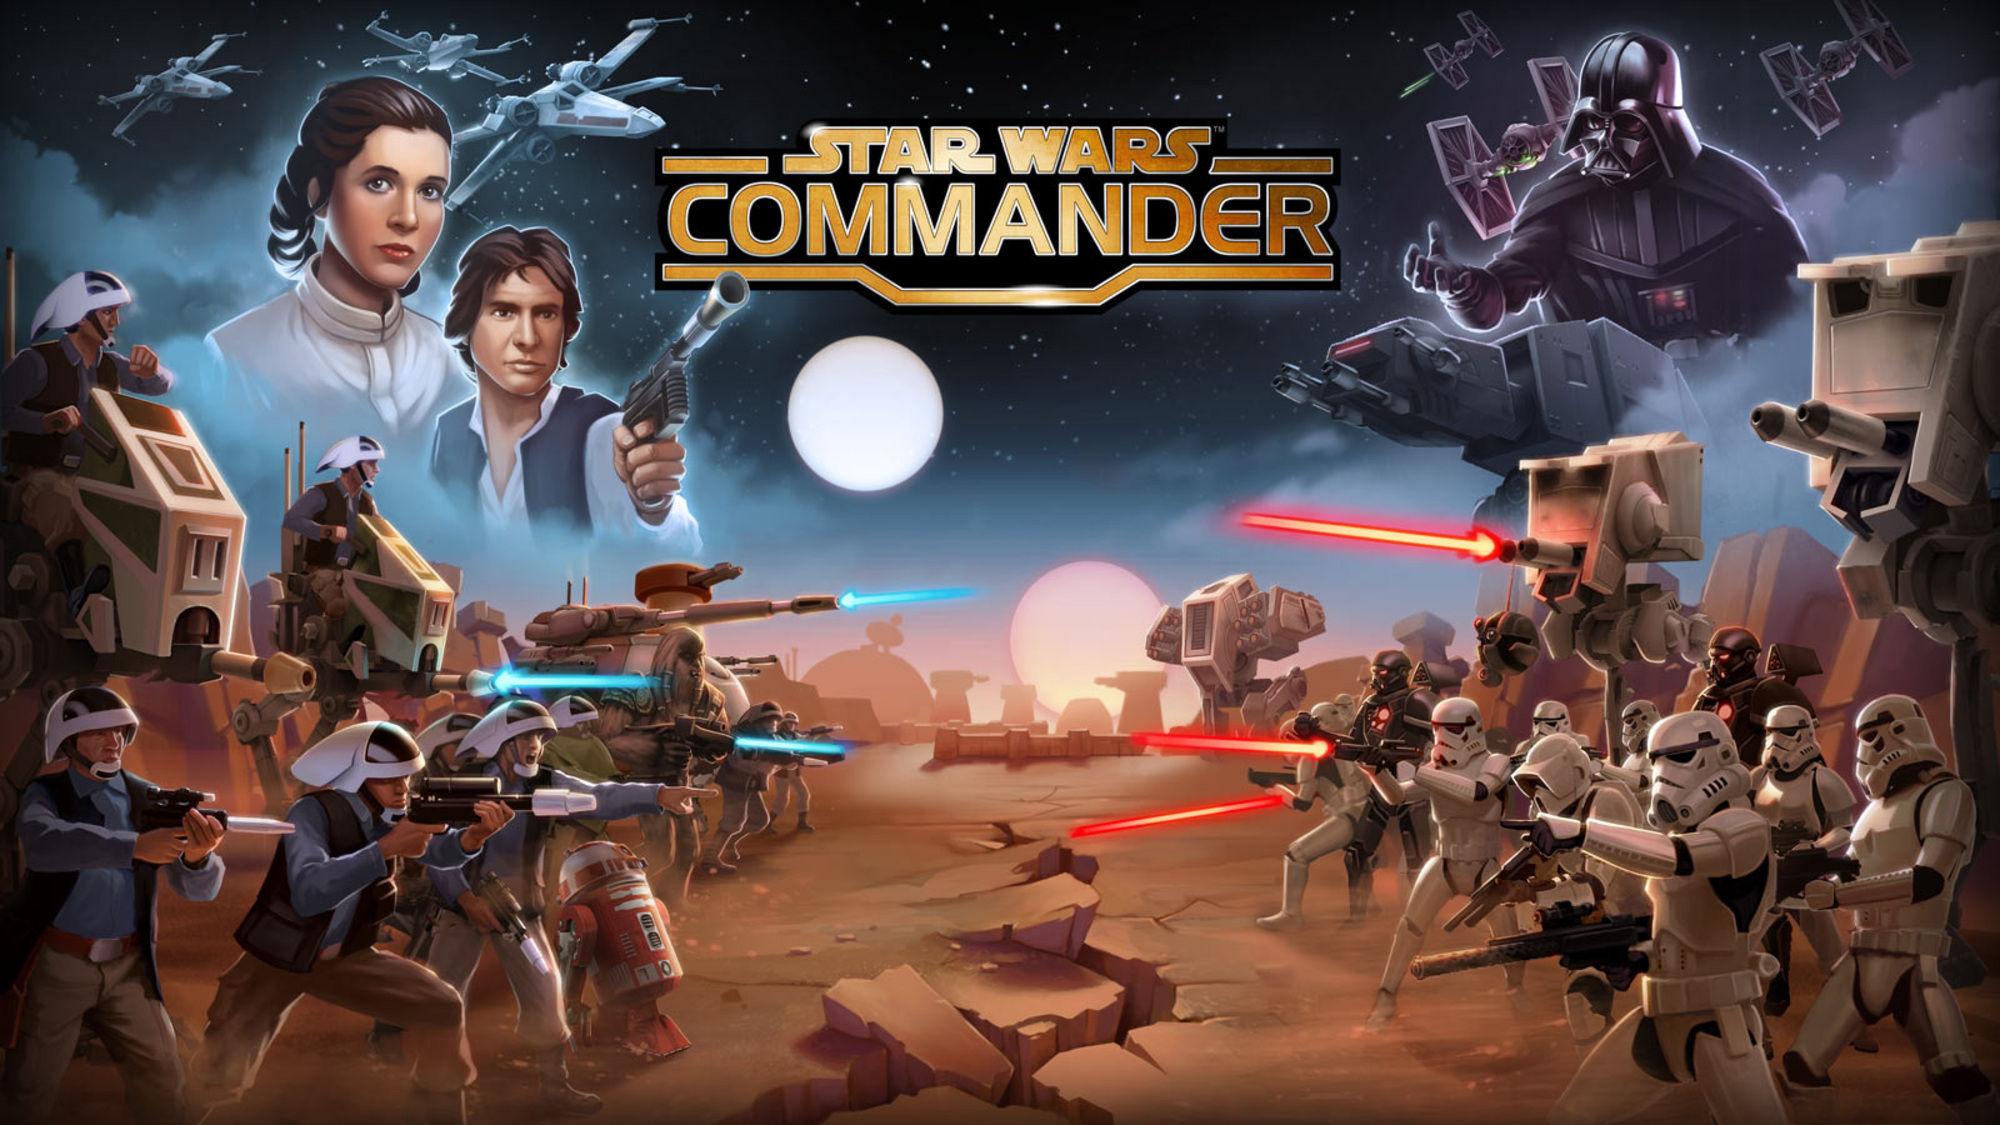 Star Wars: Commander | Wookieepedia | Fandom